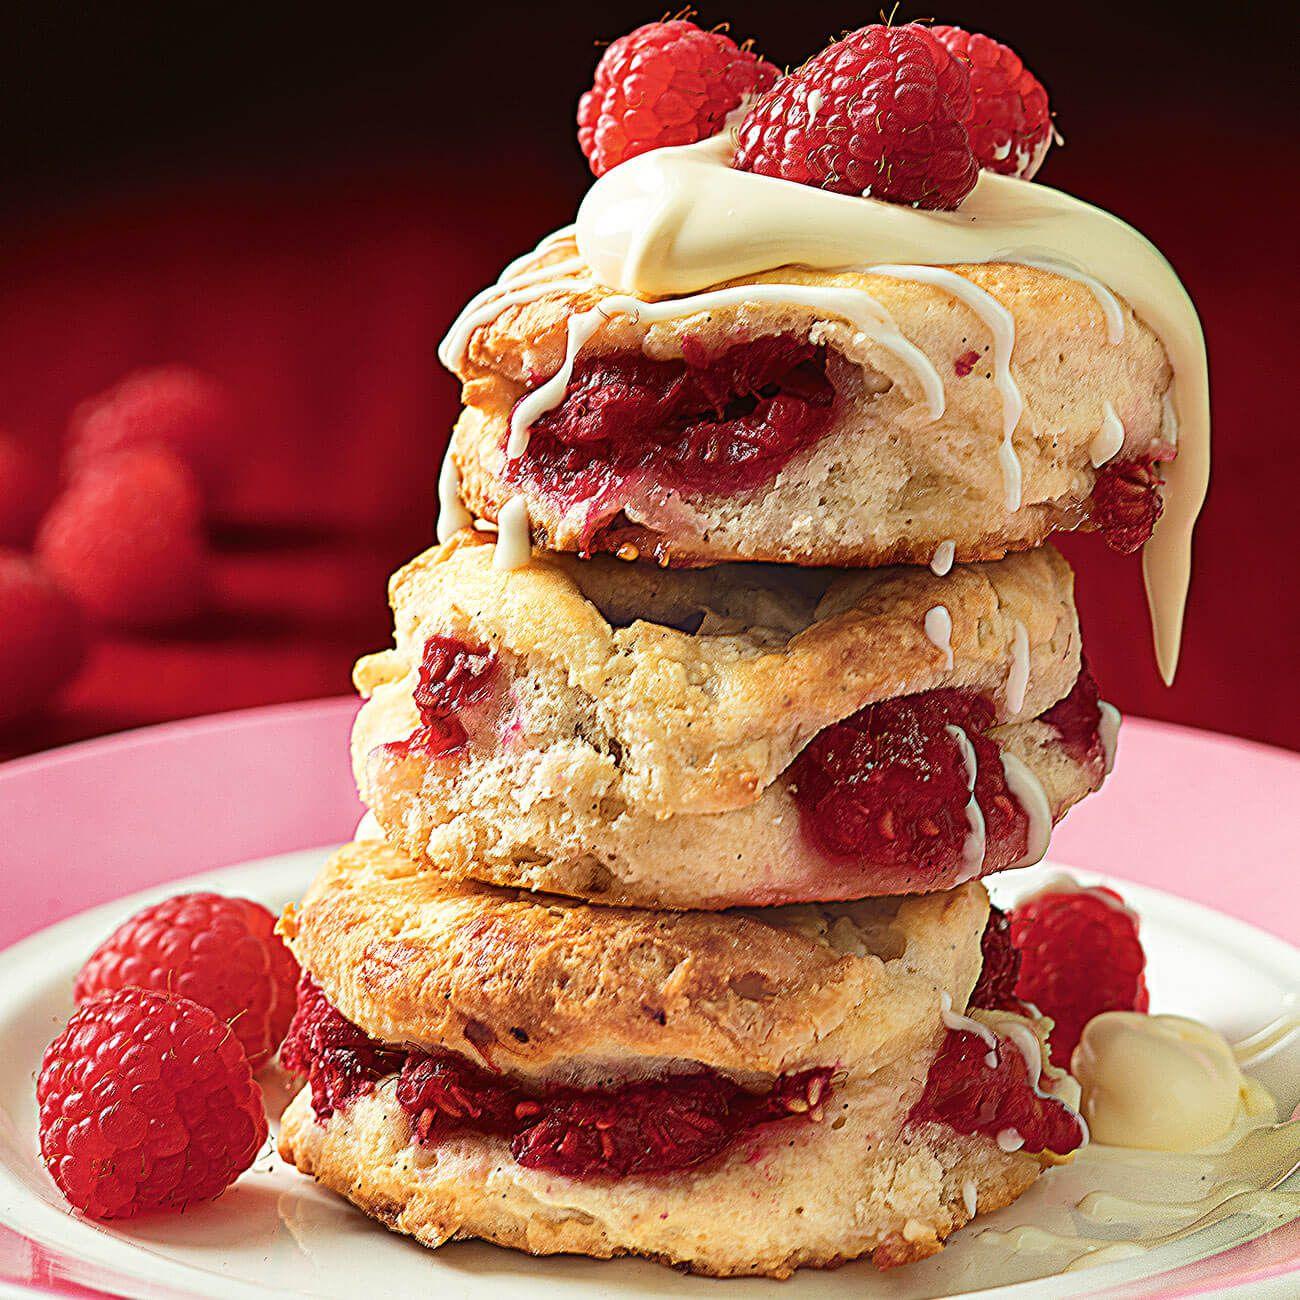 Raspberry Buttermilk Scones Recipe With Images Raspberry Scones Australian Desserts Scone Recipe